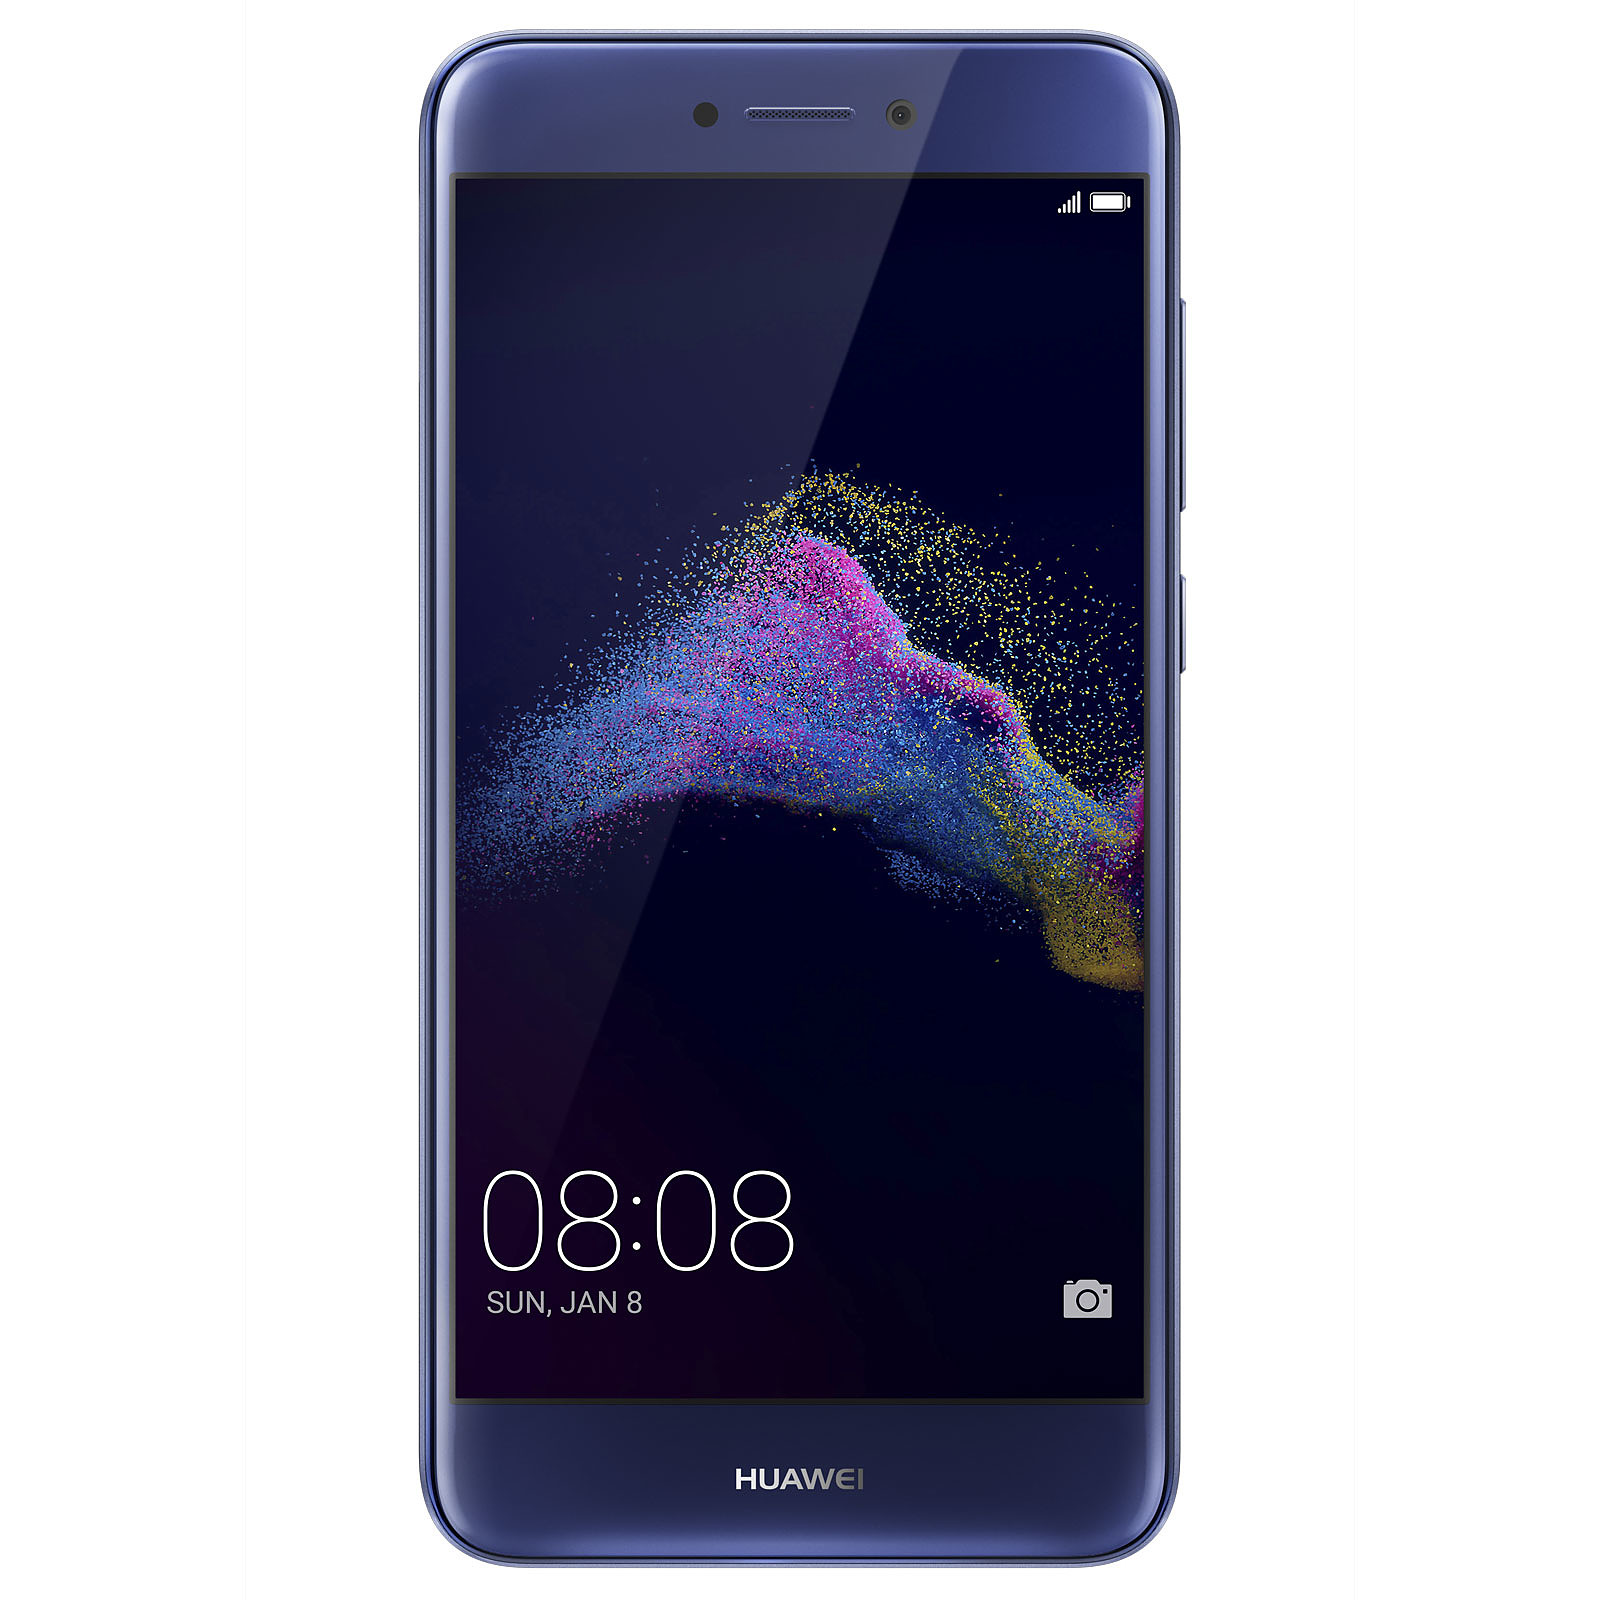 huawei p8 lite 2017 bleu